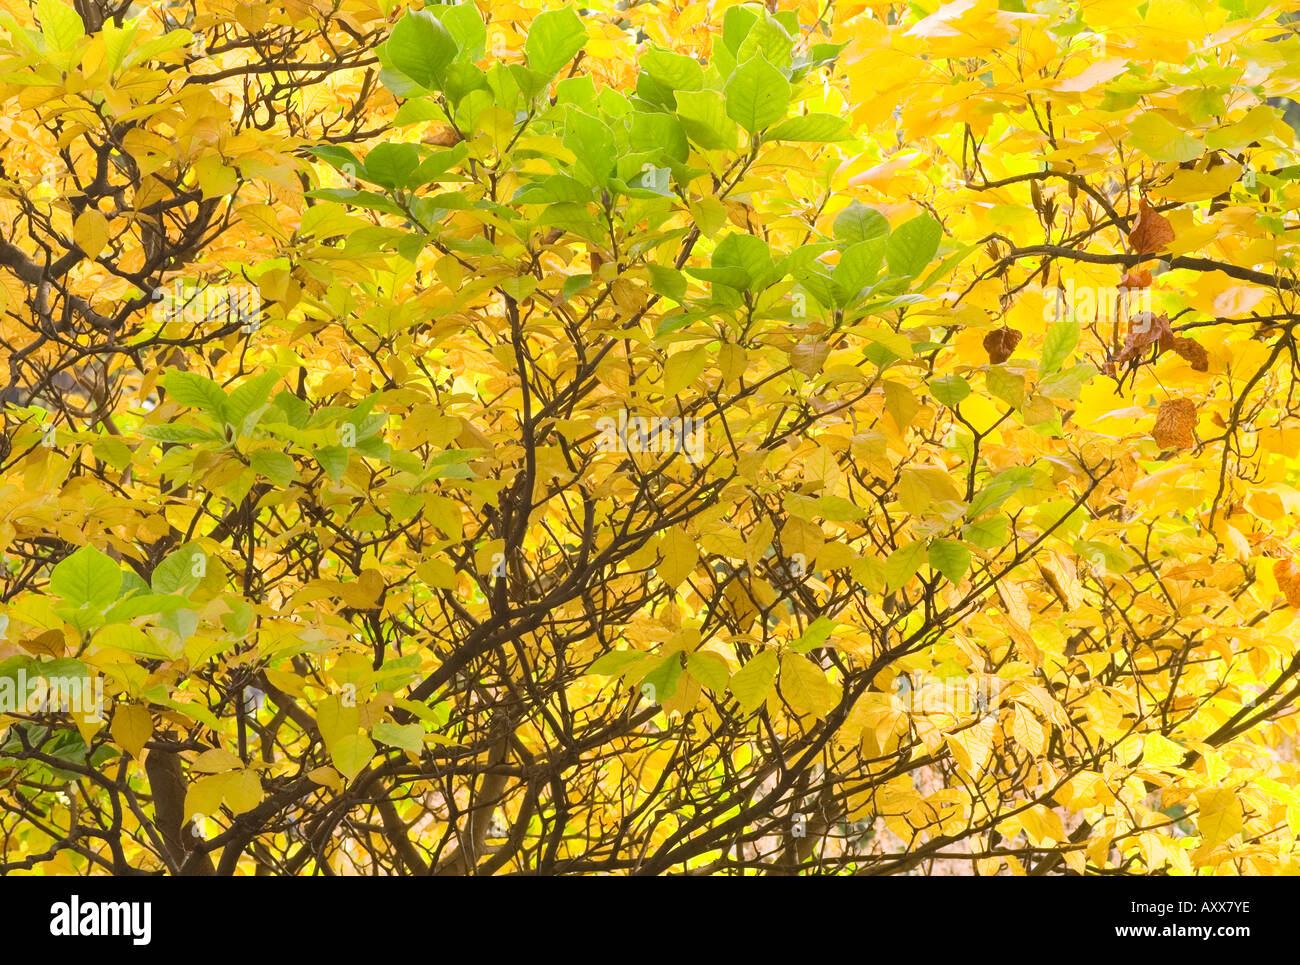 Magnolia Leaves Turning Yellow In Autumn Stock Photo 9674749 Alamy